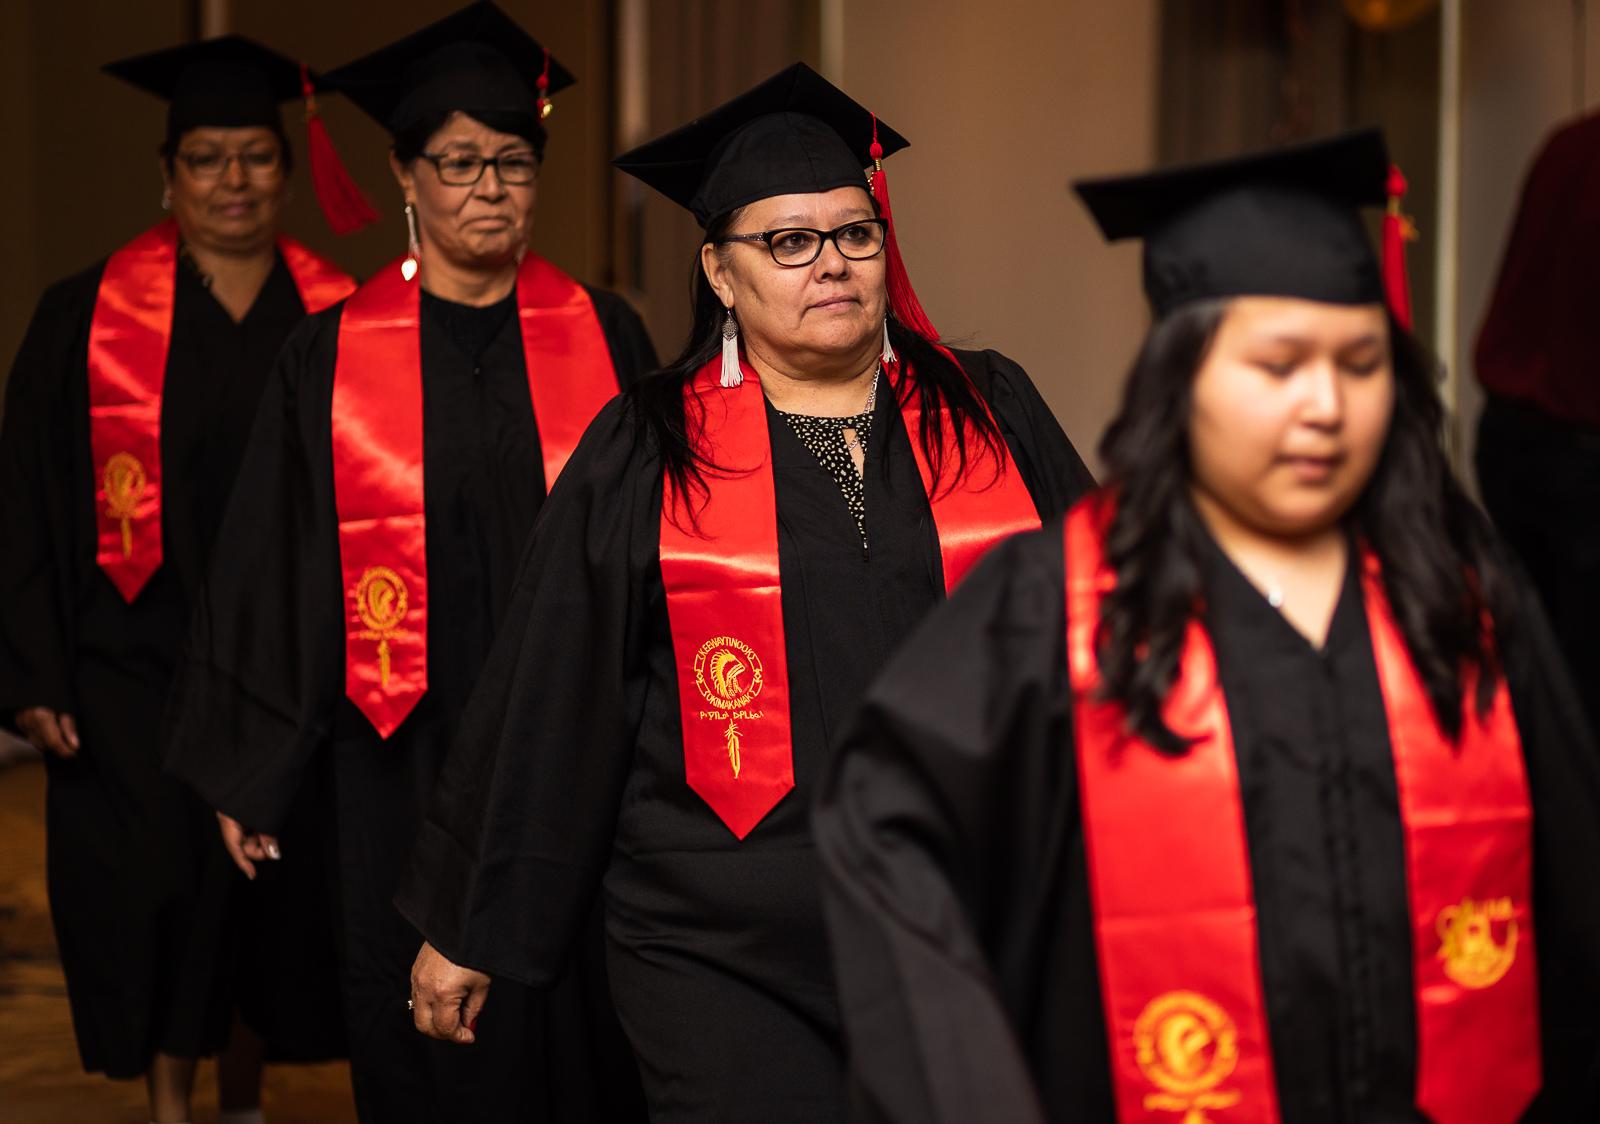 kihs-graduation-2019-fb-11.jpg